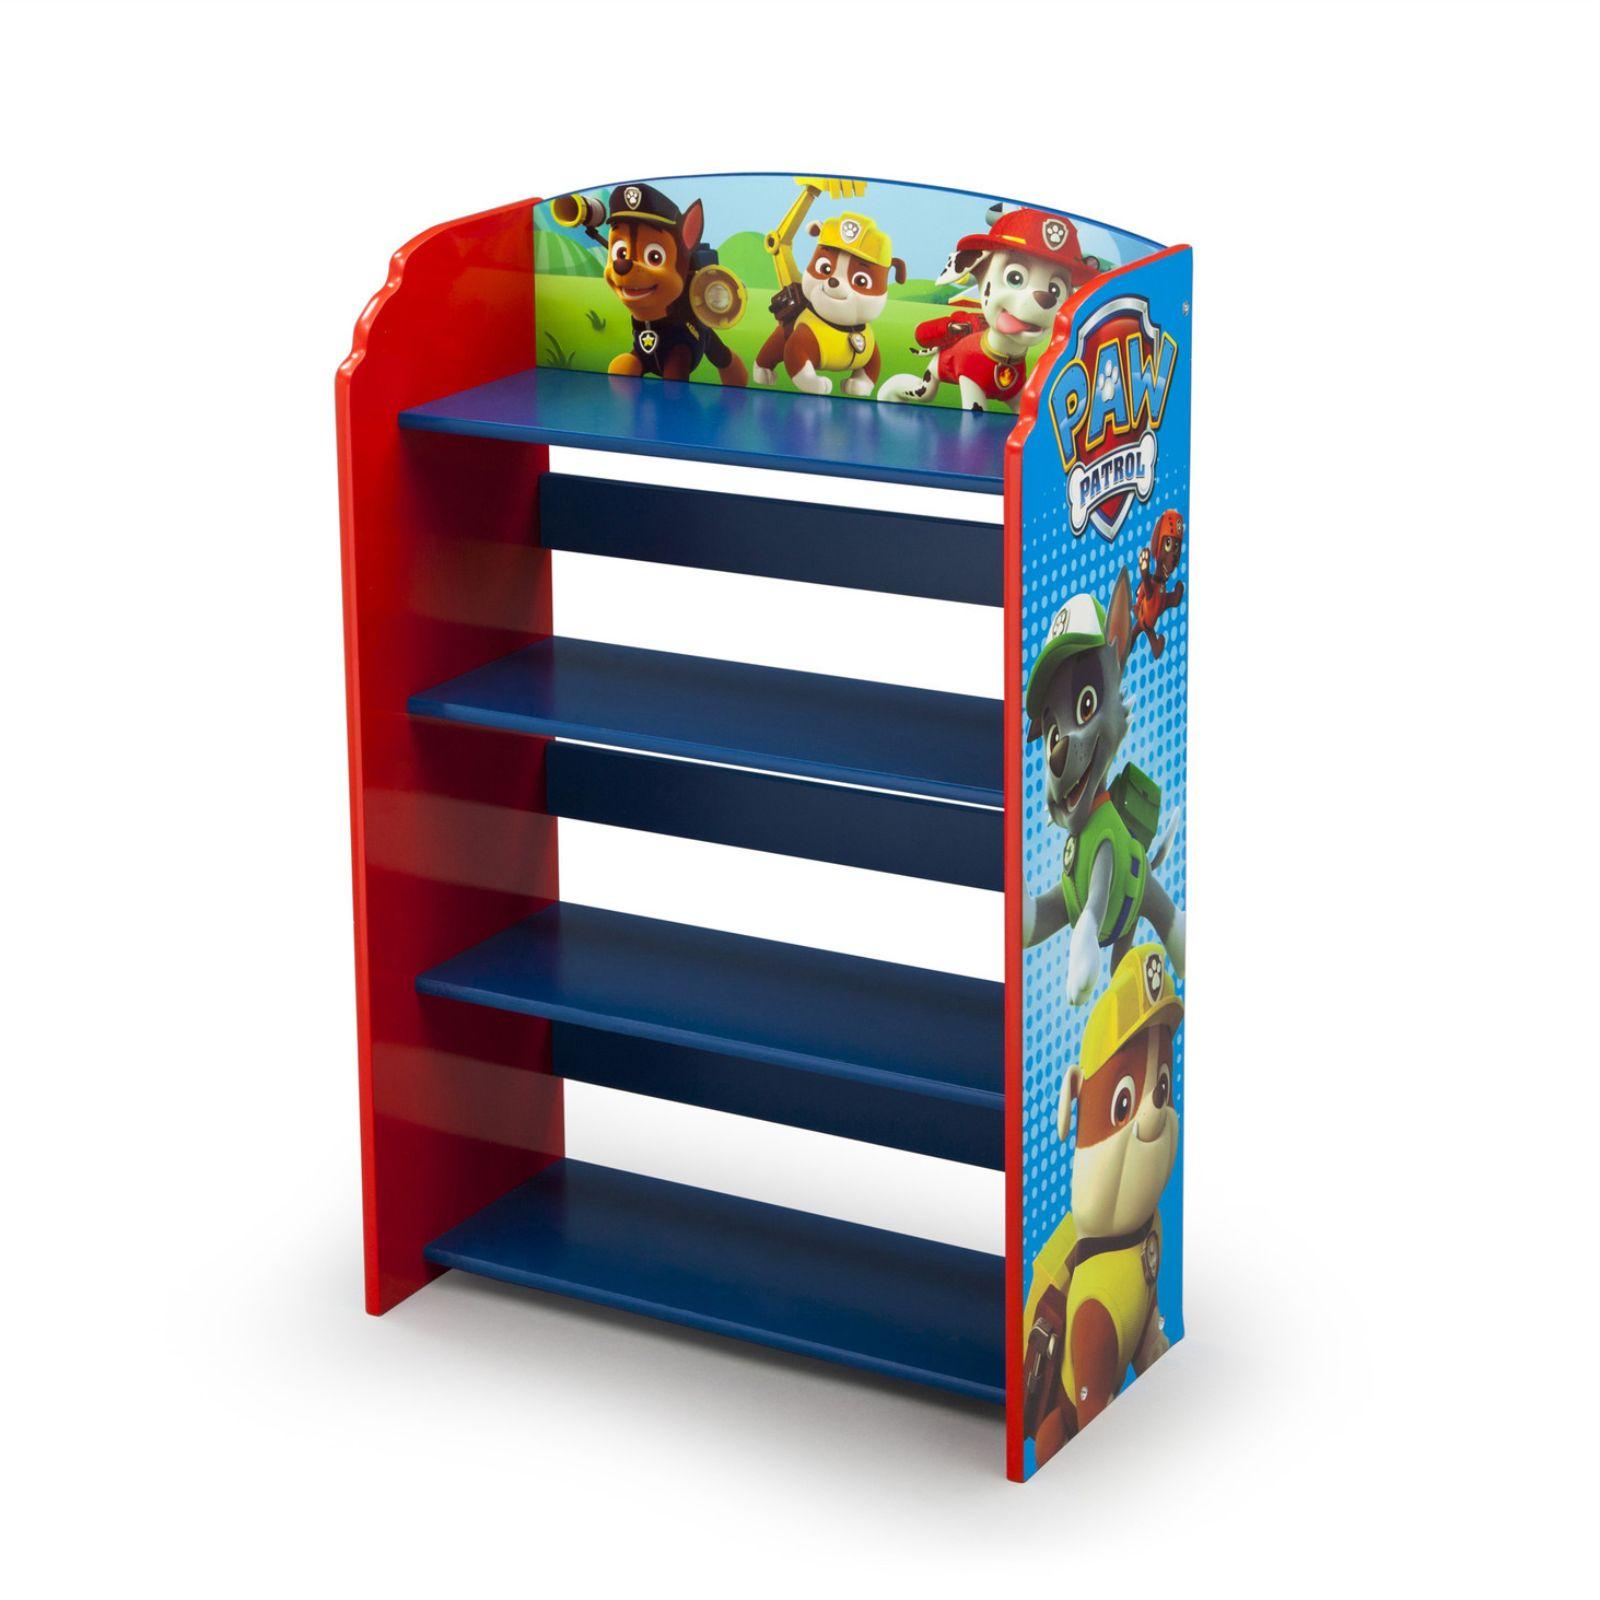 New Delta Chldren Paw Patrol Wooden Bookcase Nursery Playroom Book Shelves